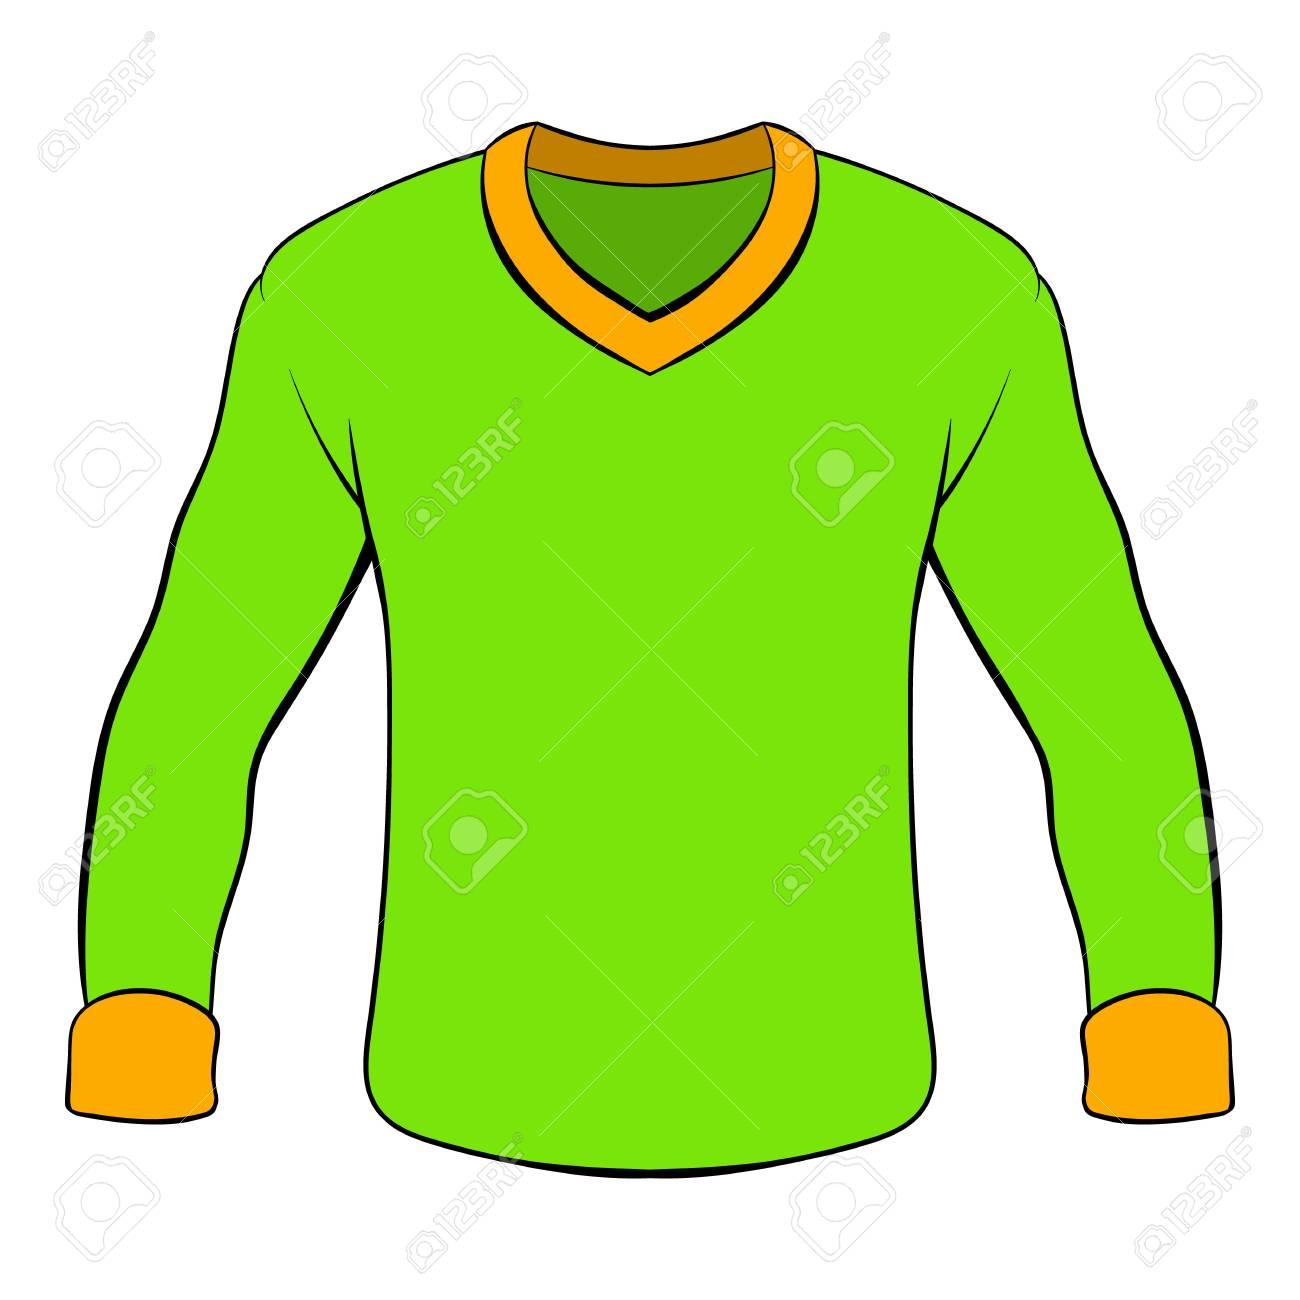 Mens shirt with long sleeves icon cartoon.